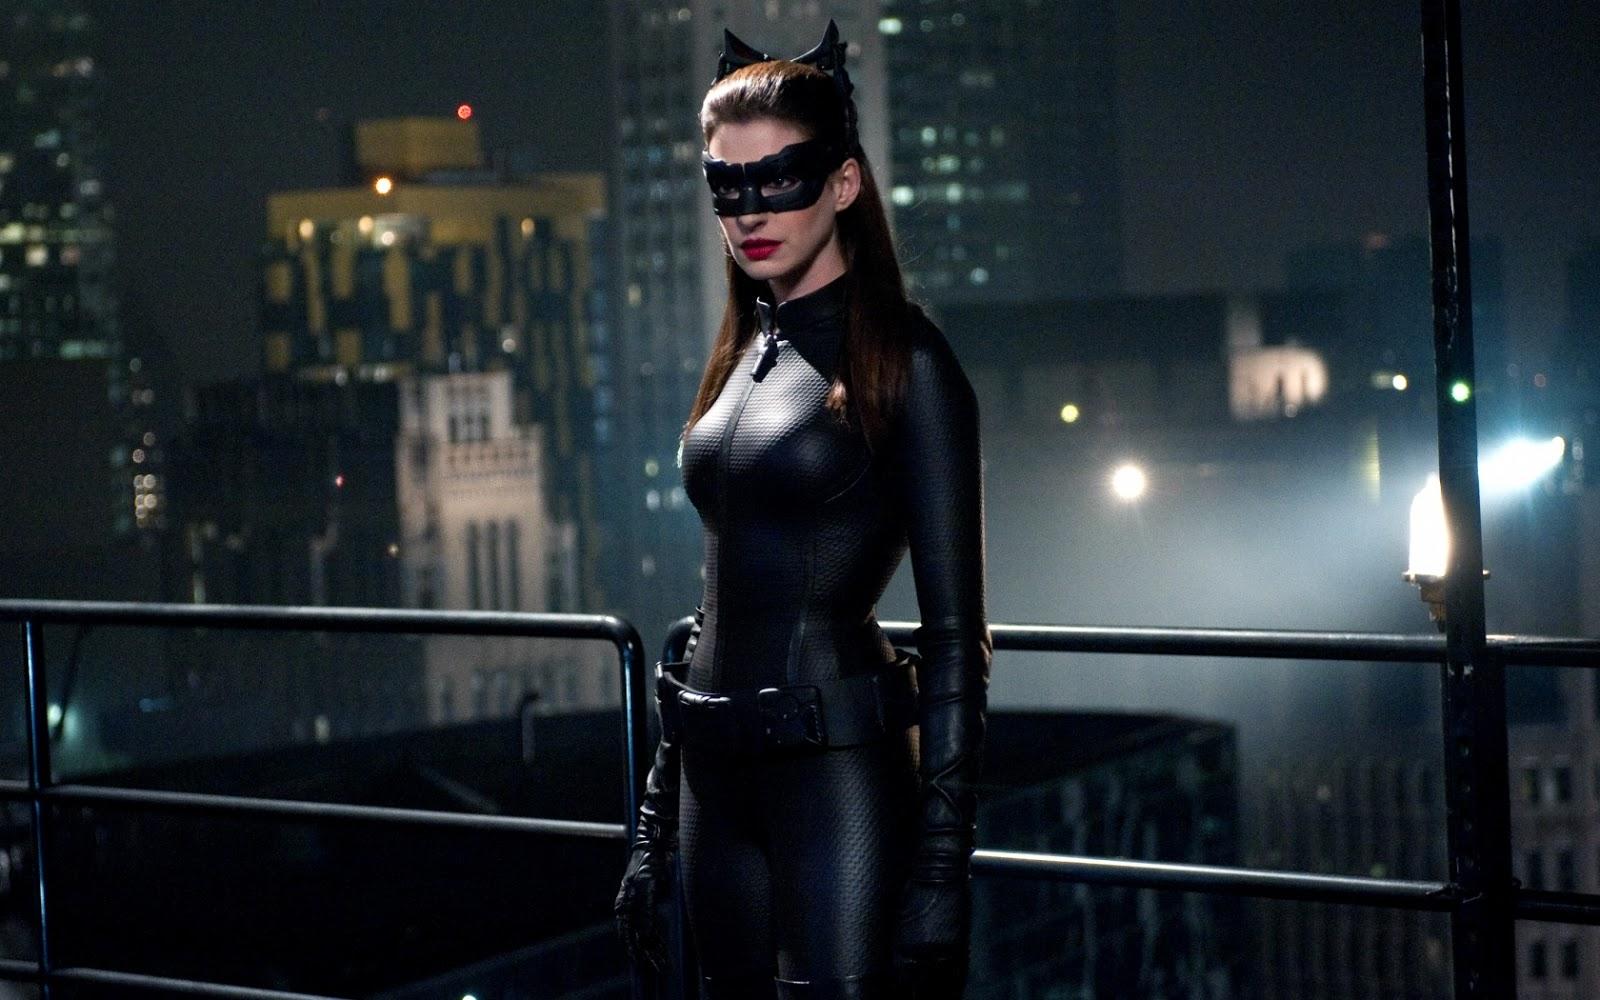 http://4.bp.blogspot.com/-mnEjPd0zVhg/UNXTYkyOtnI/AAAAAAAAAuo/ZLIxVlMWJgY/s1600/anne_hathaway_catwoman_dark_knight_rises-1680x1050.jpg